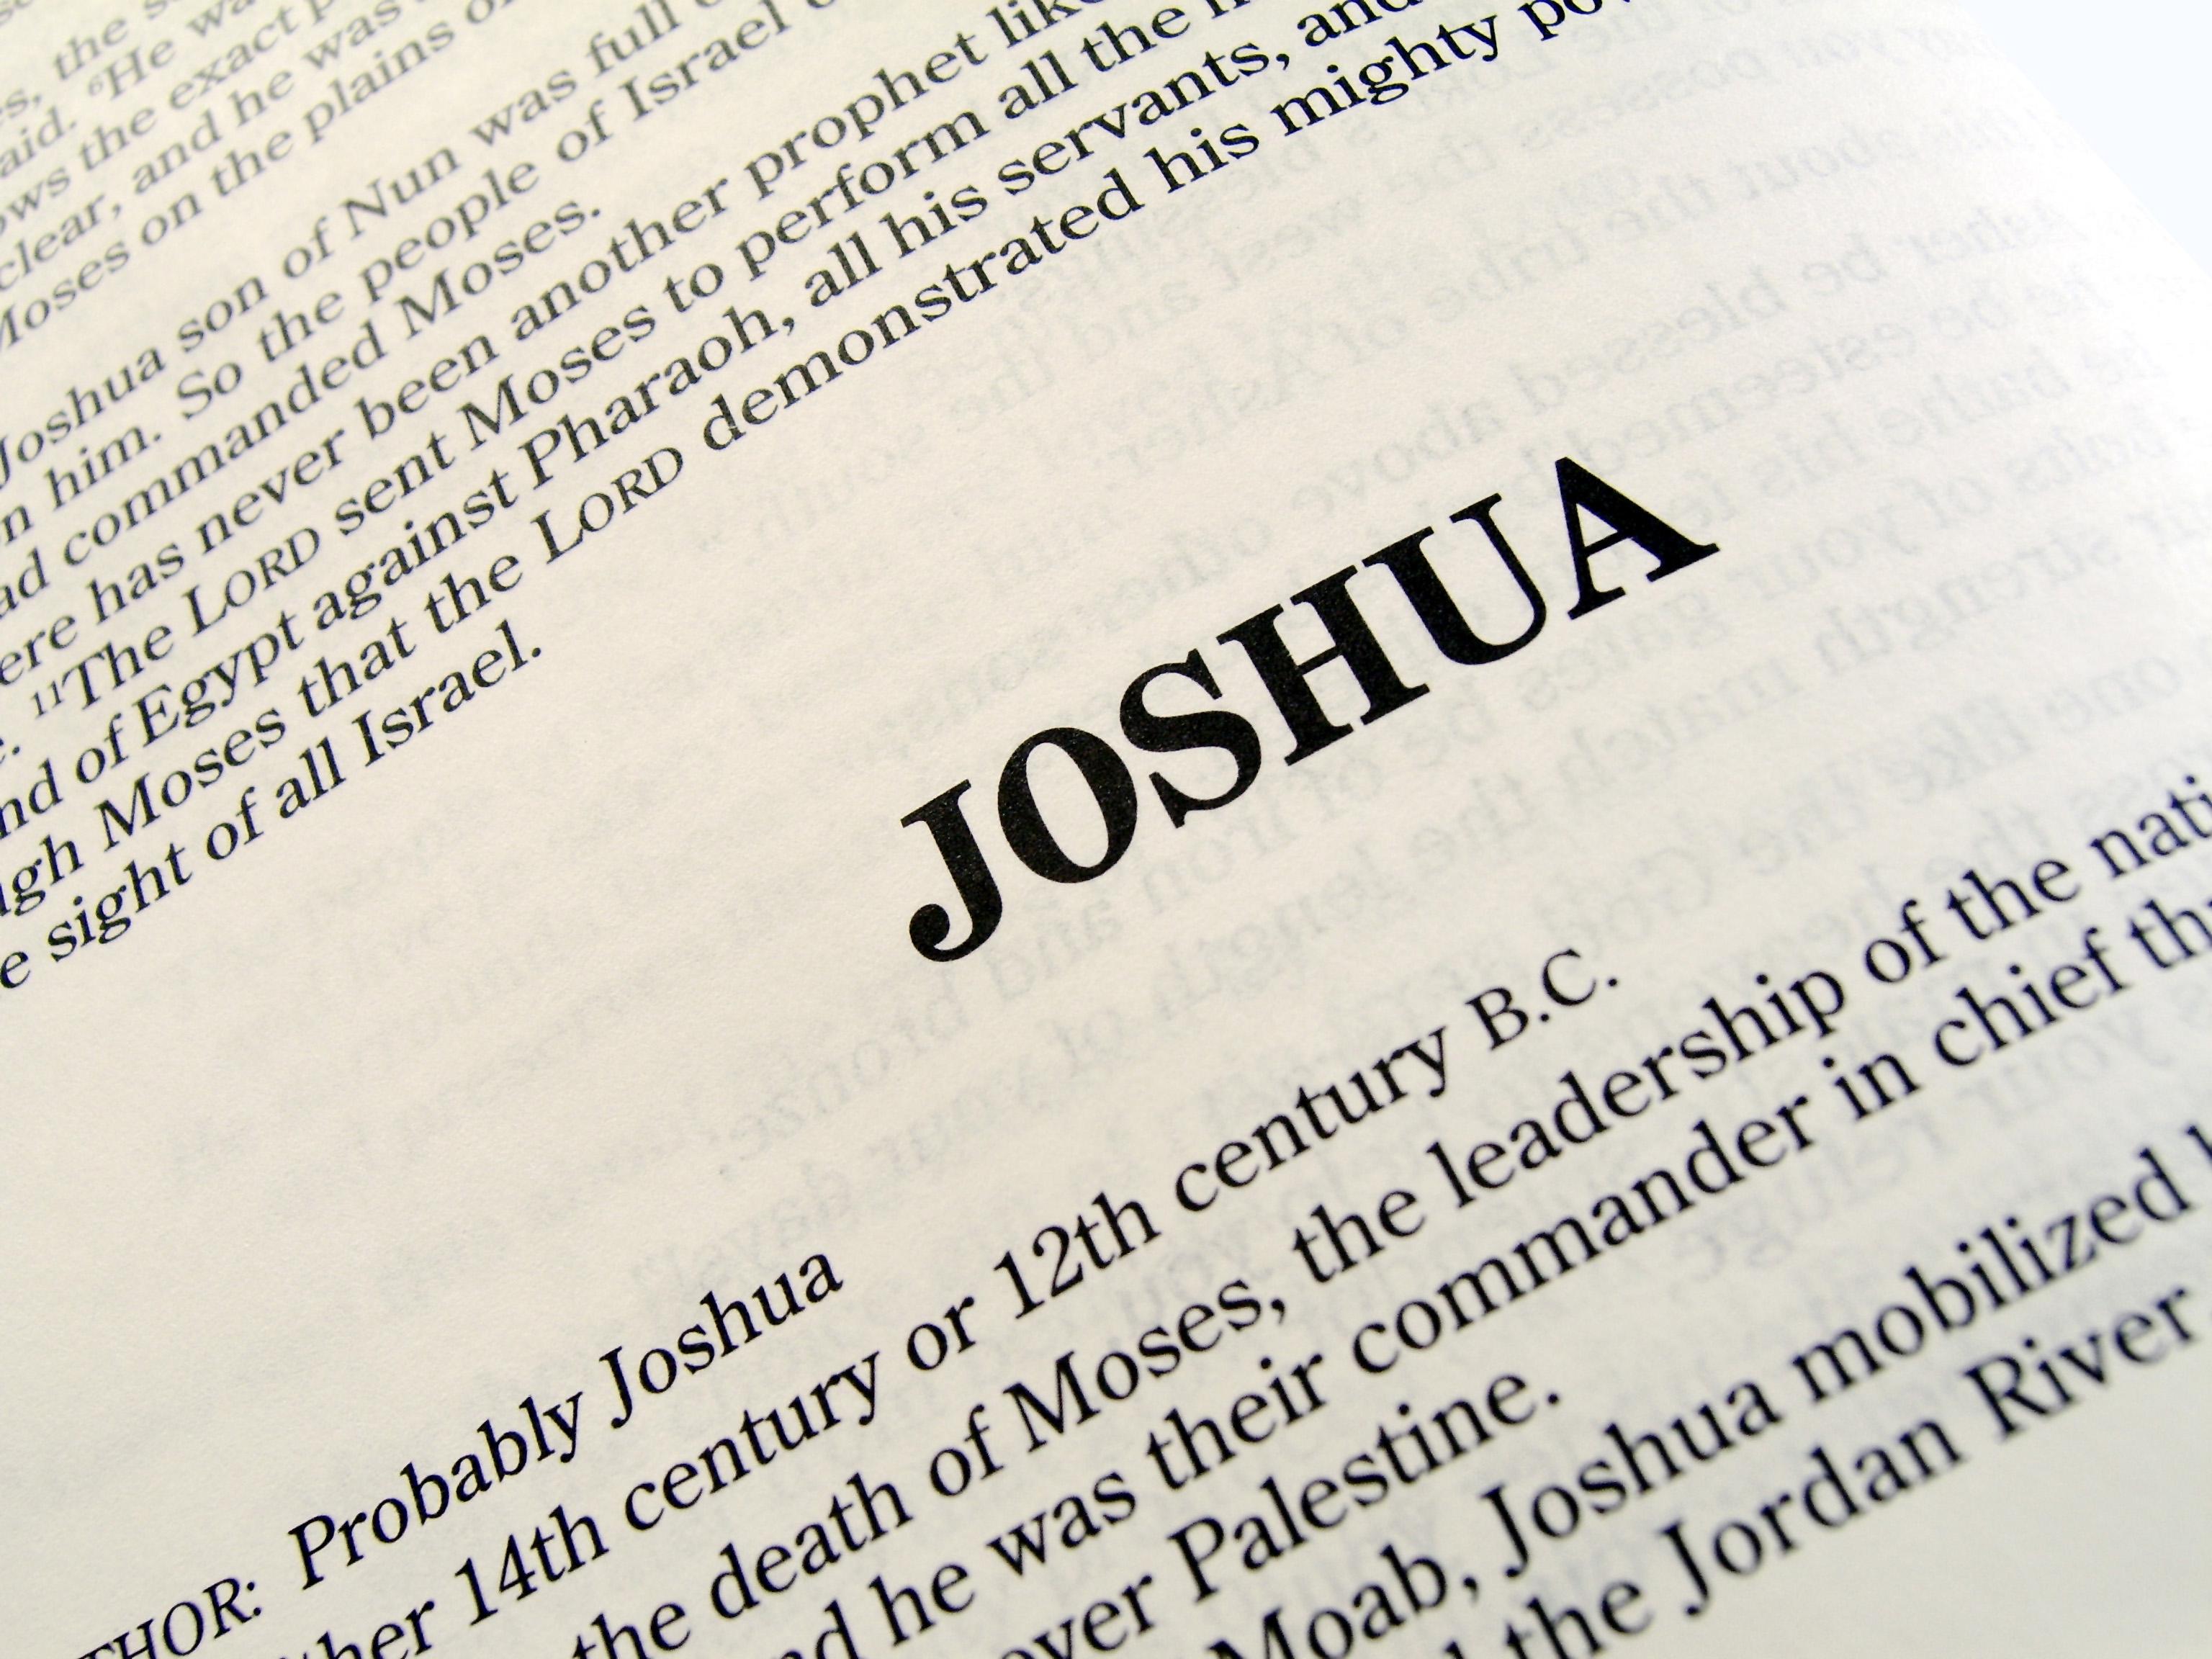 Joshua-Wayne Barber/Part 19